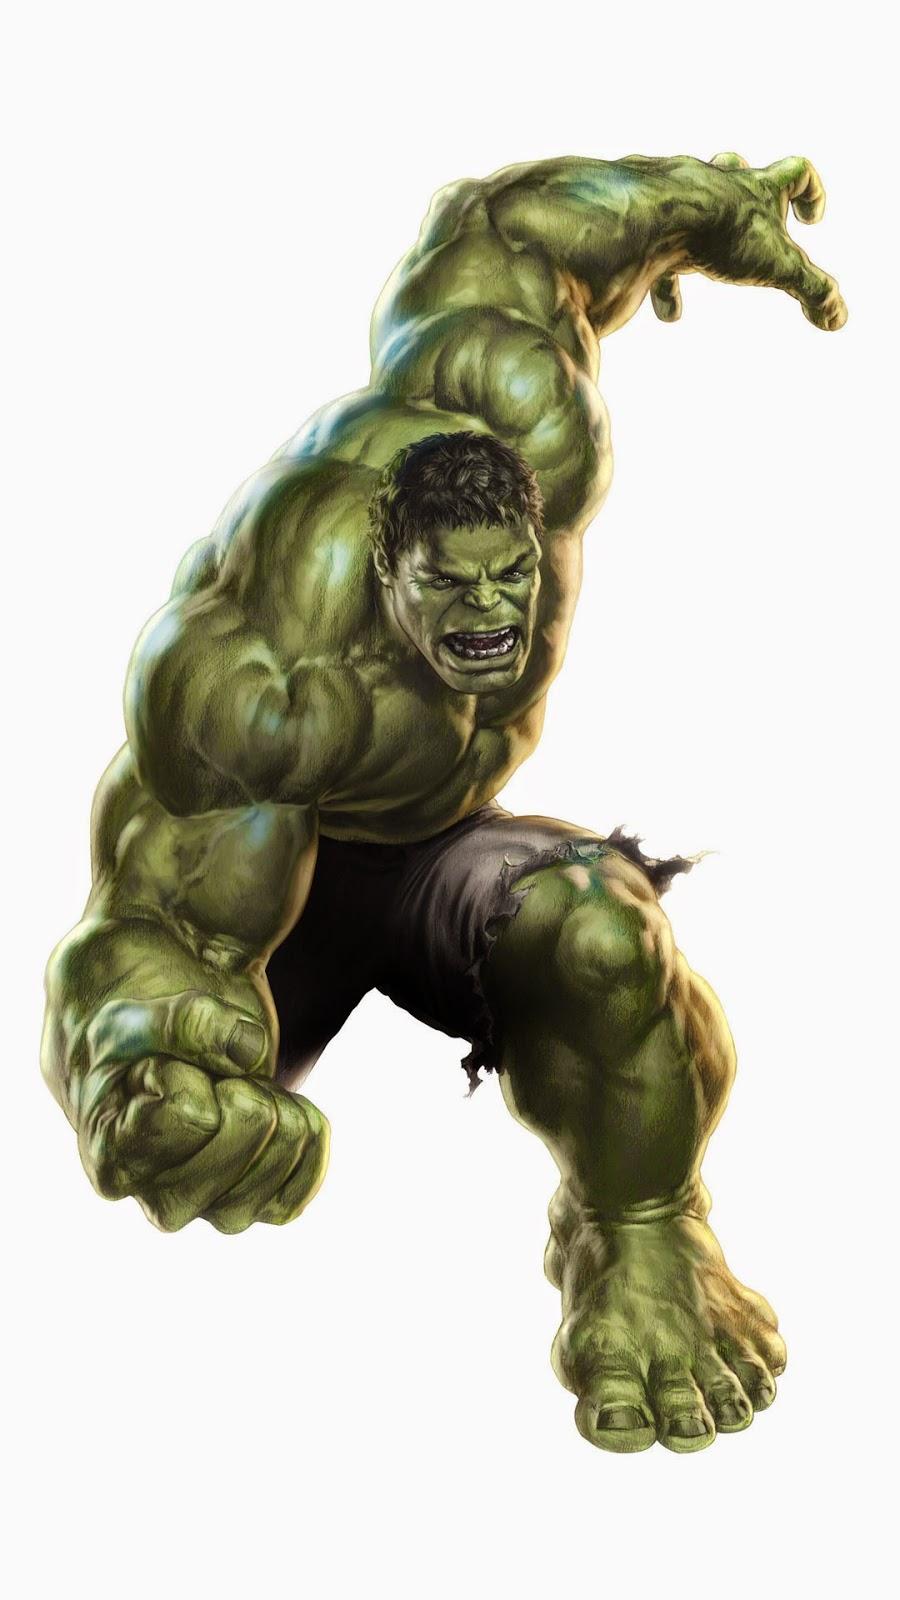 comic cartoons: The Hulk